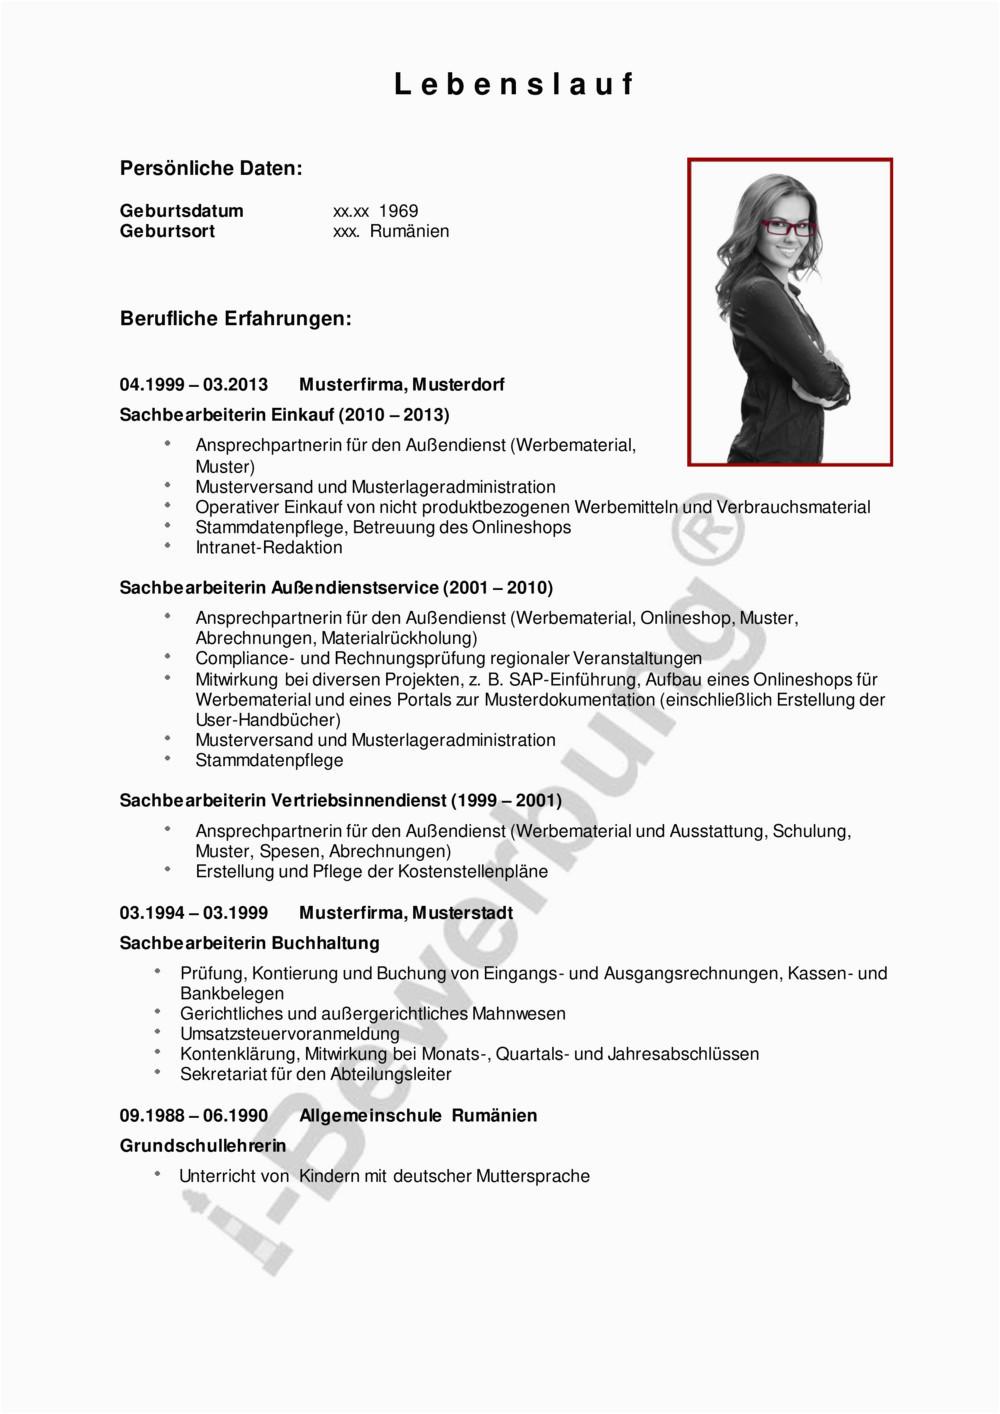 Lebenslauf Initiativbewerbung Teamassistenz pdf